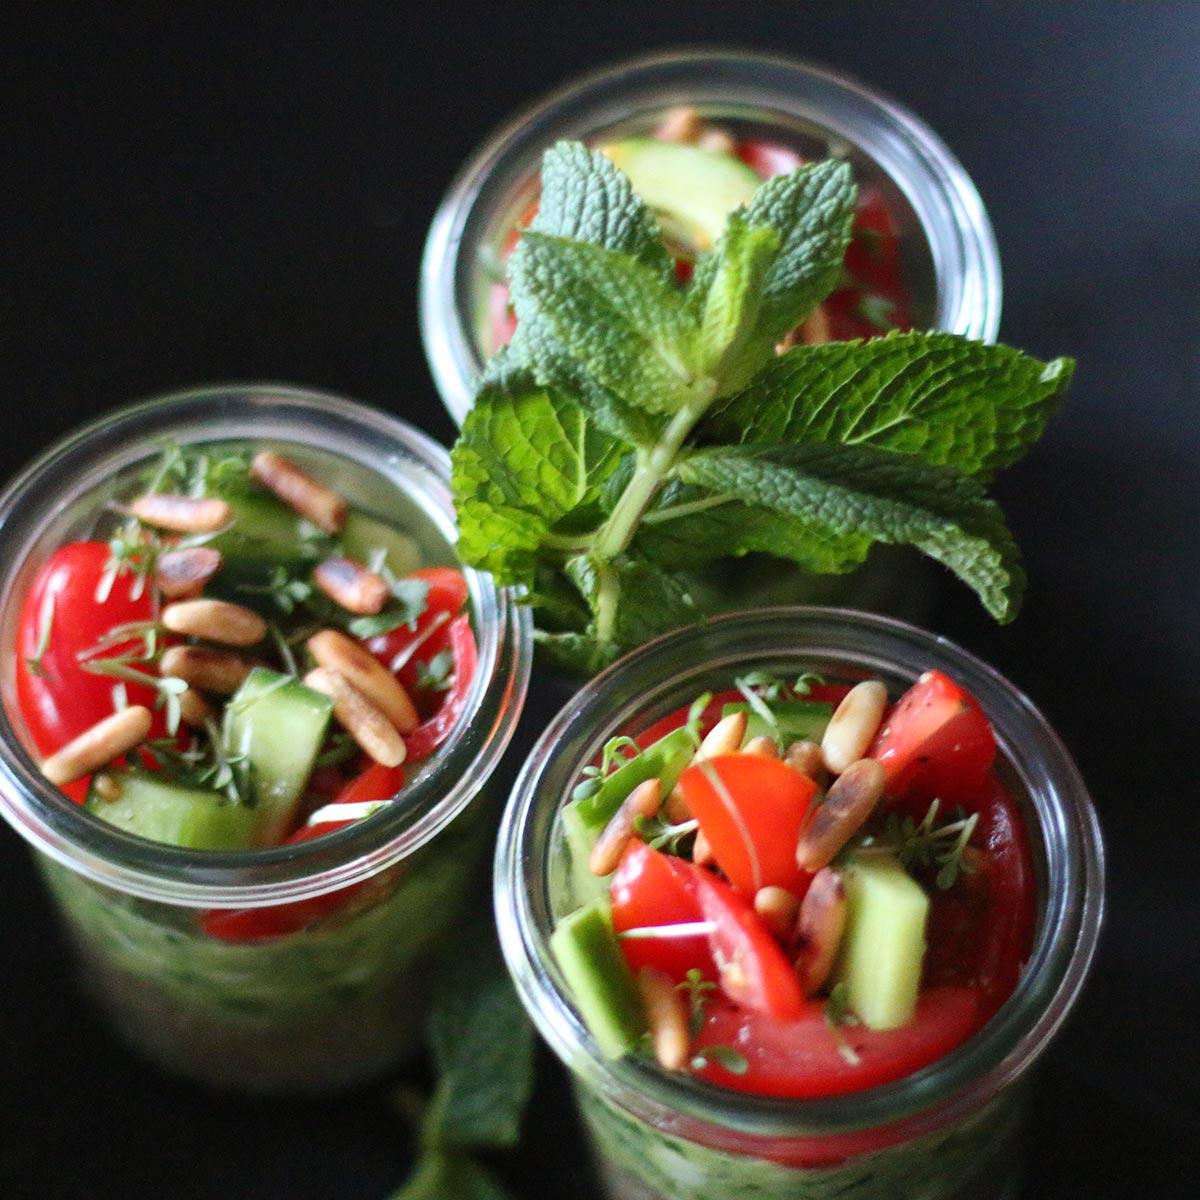 Hühnchen, Guacamole, Quinoa - Dreierlei im Glas